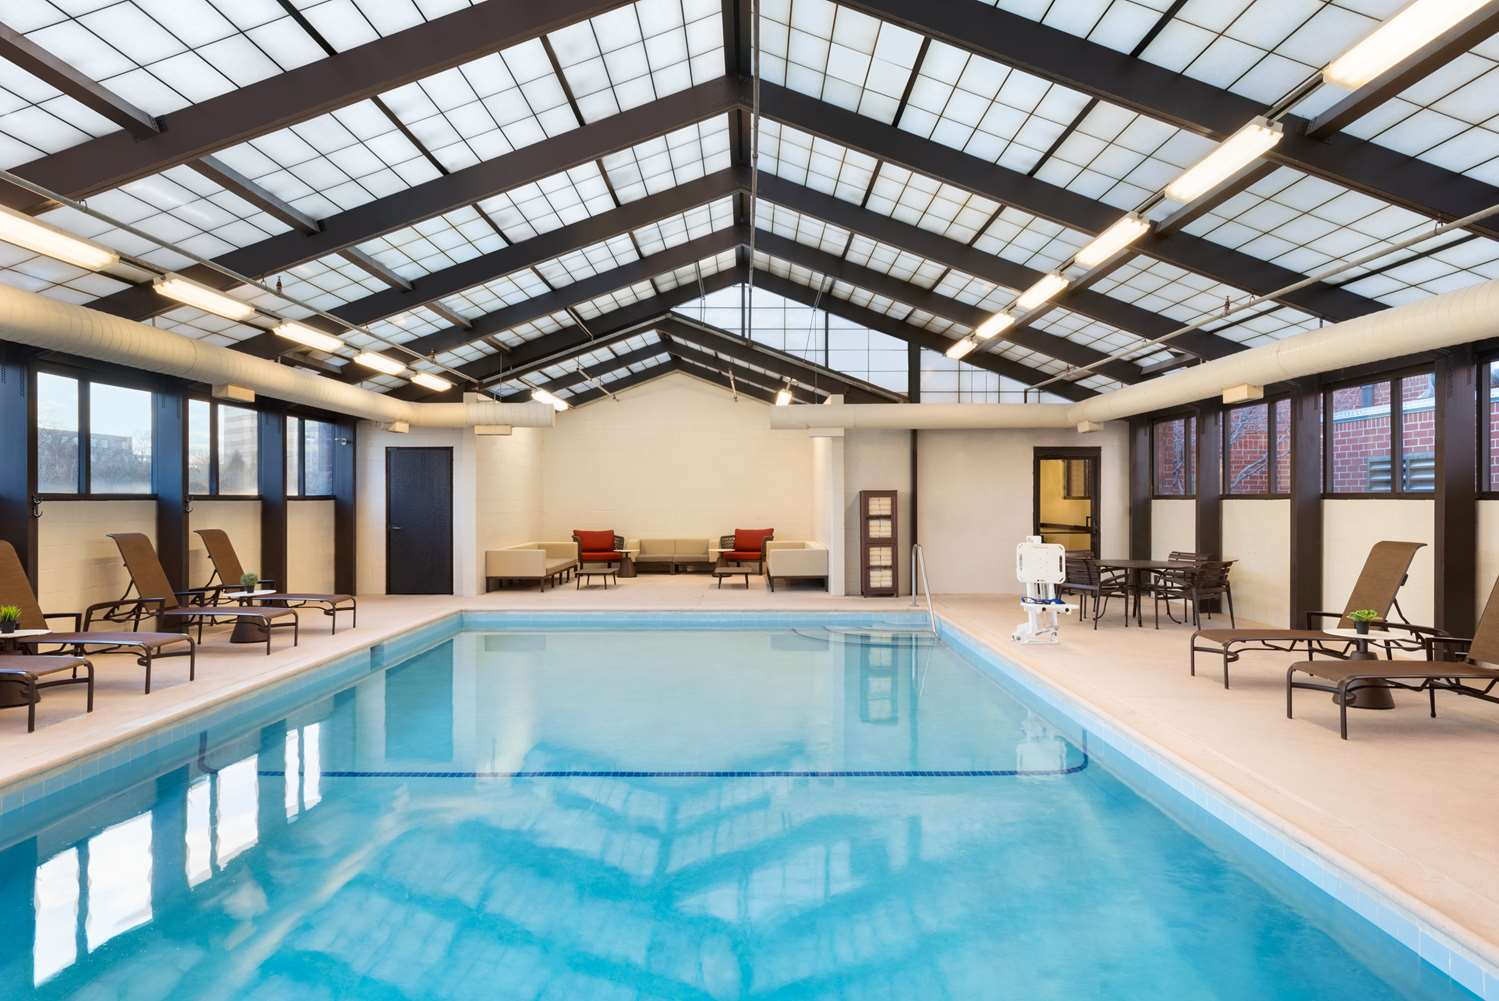 Pool - Hyatt Place Hotel Schaumburg